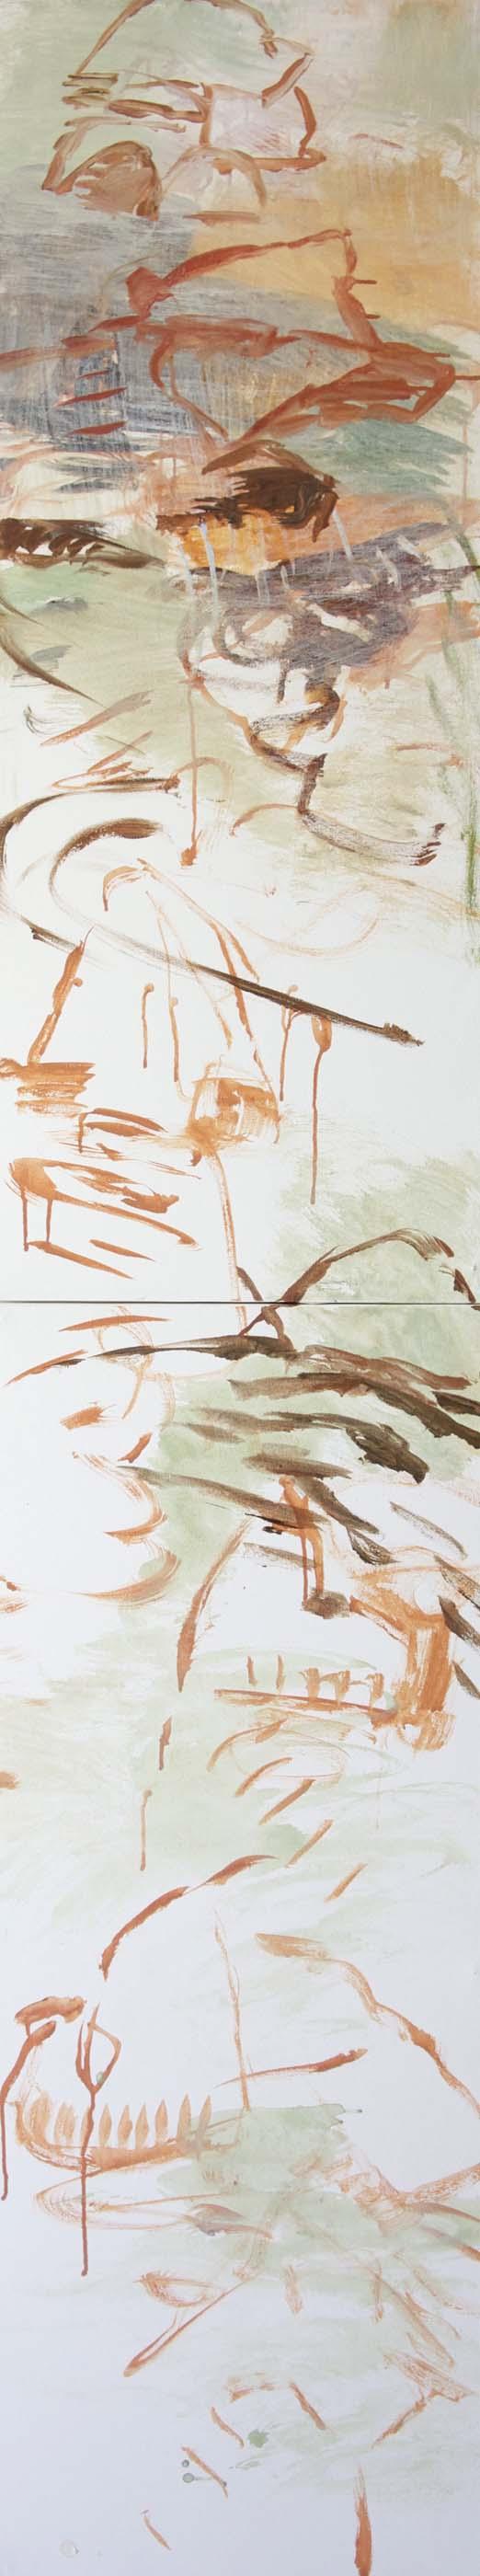 "DAY 1: chang creek 96x18""  acrylic on canvas"